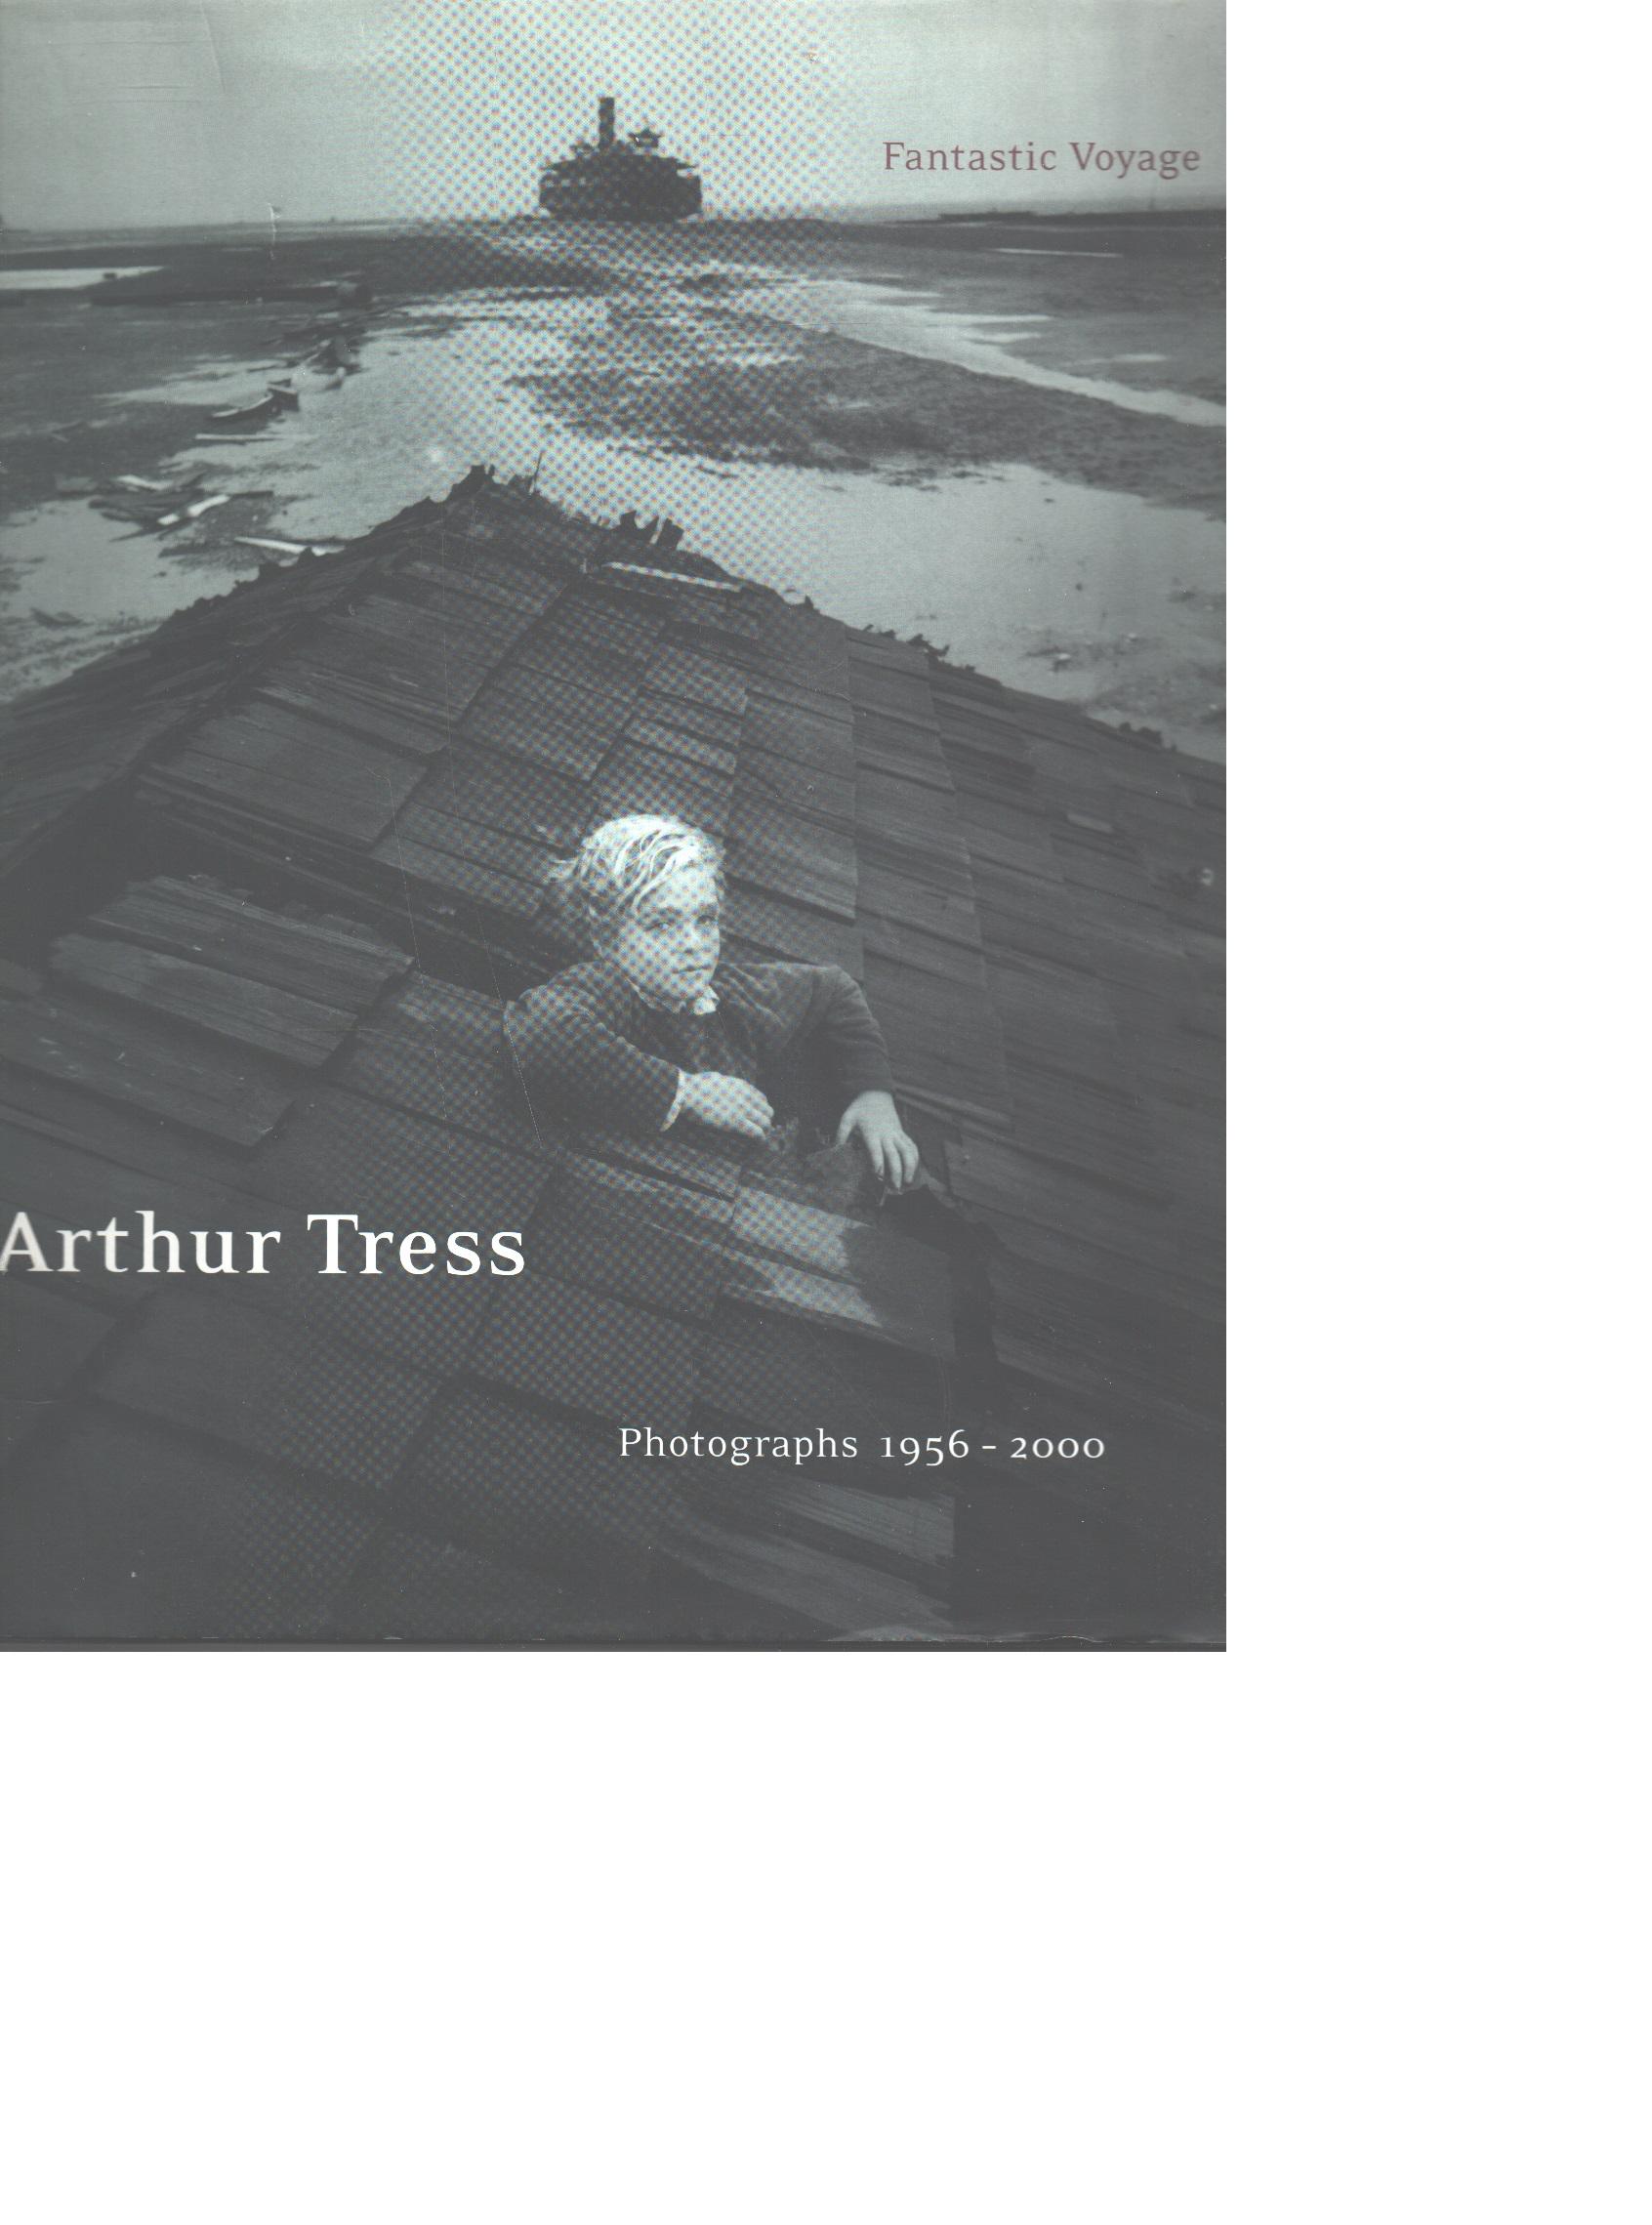 Arthur Tress : fantastic voyage : photographs 1956-2000 - Lorenz, Richard  and Tress, Arthur